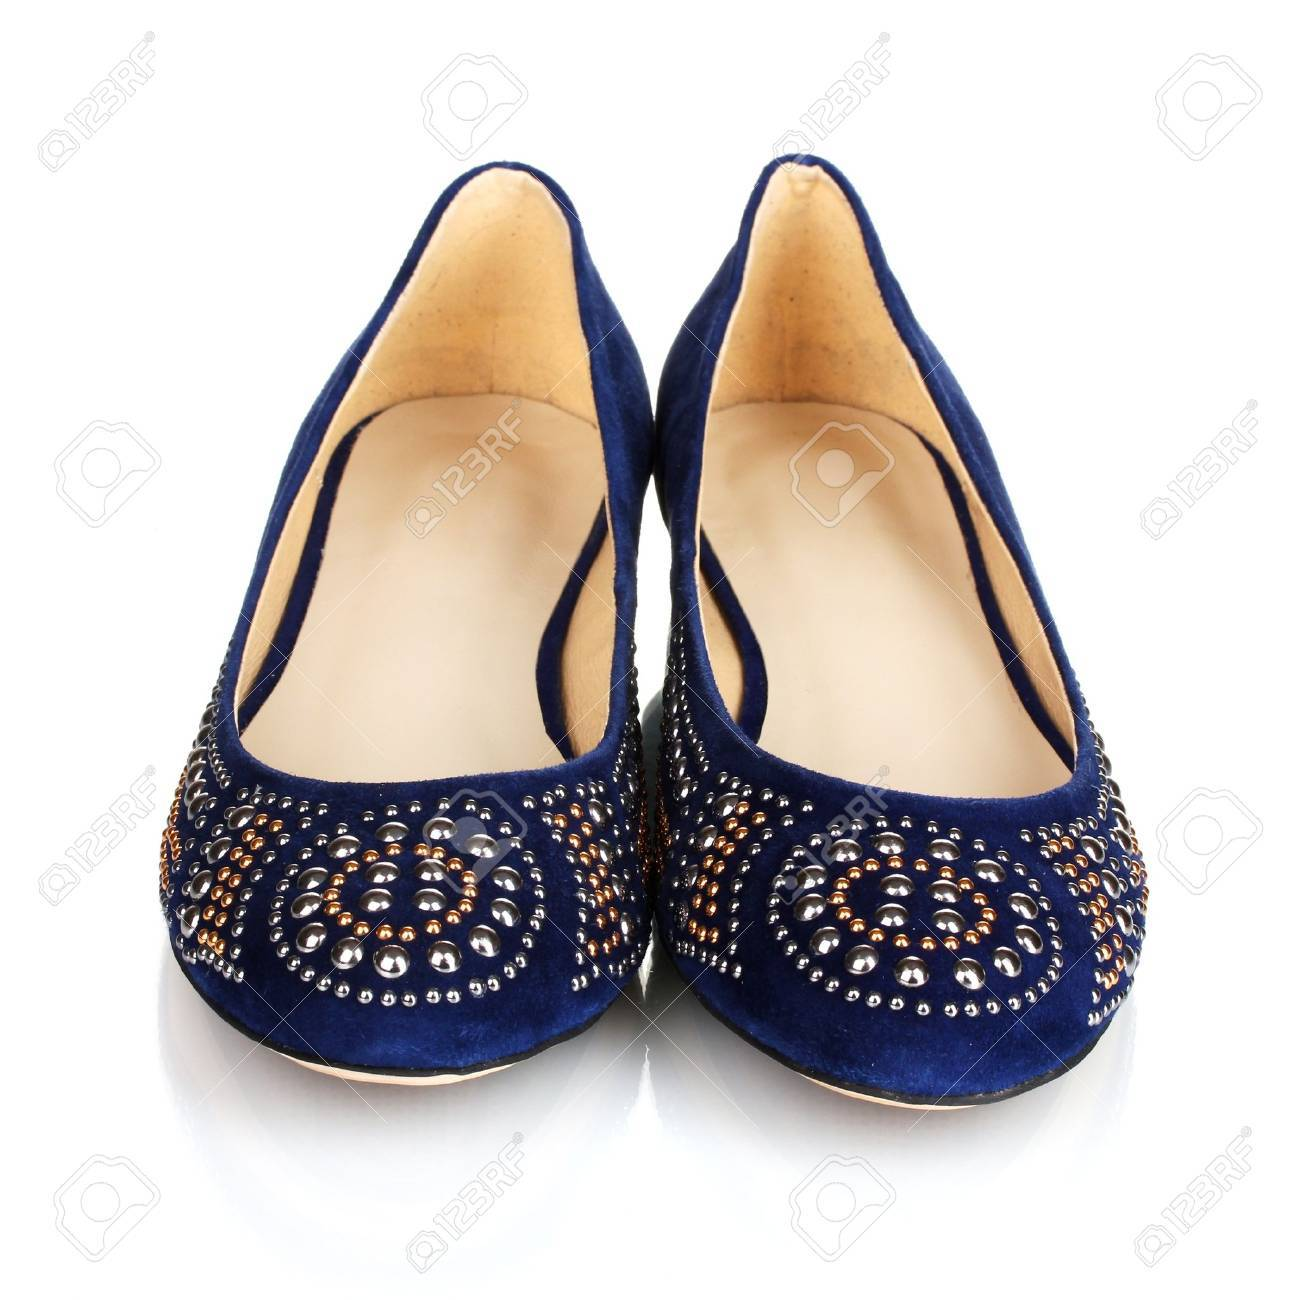 Suede Women's Blue Stiletto Heel Pointed Toe Pumps Heels Shoes